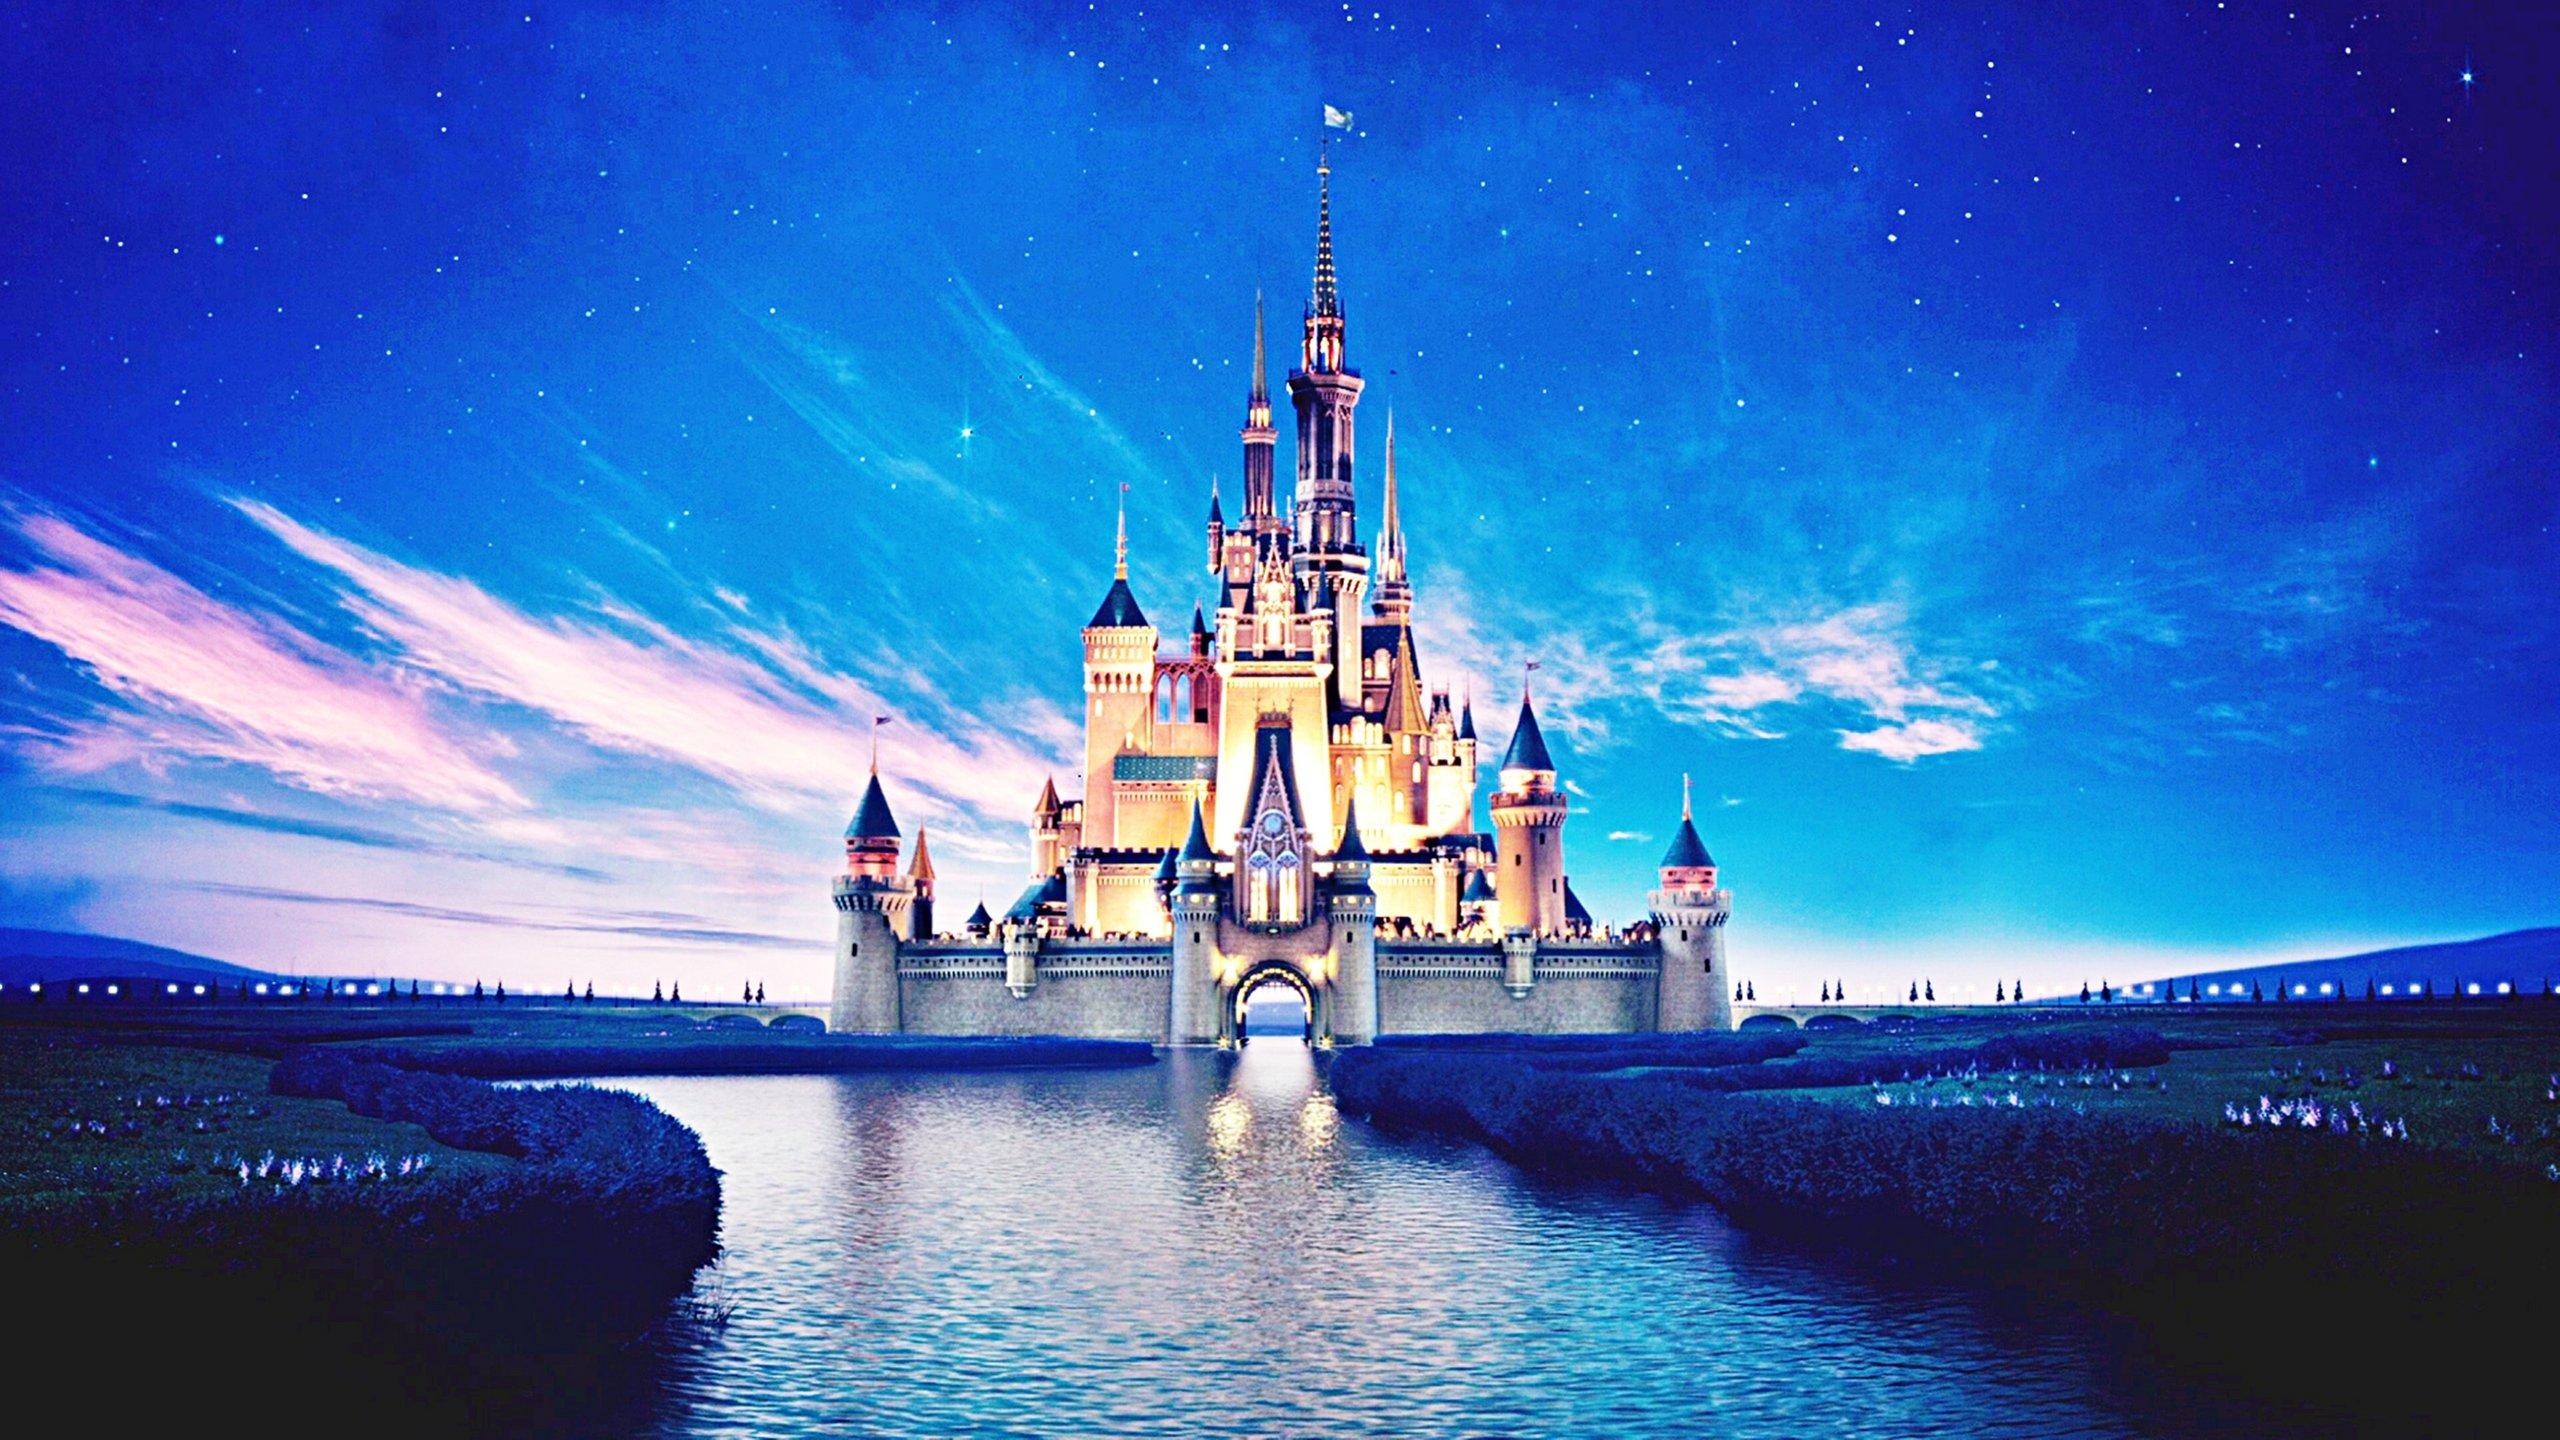 Disney Castle wallpaper | 2560x1440 | 584206 | WallpaperUP